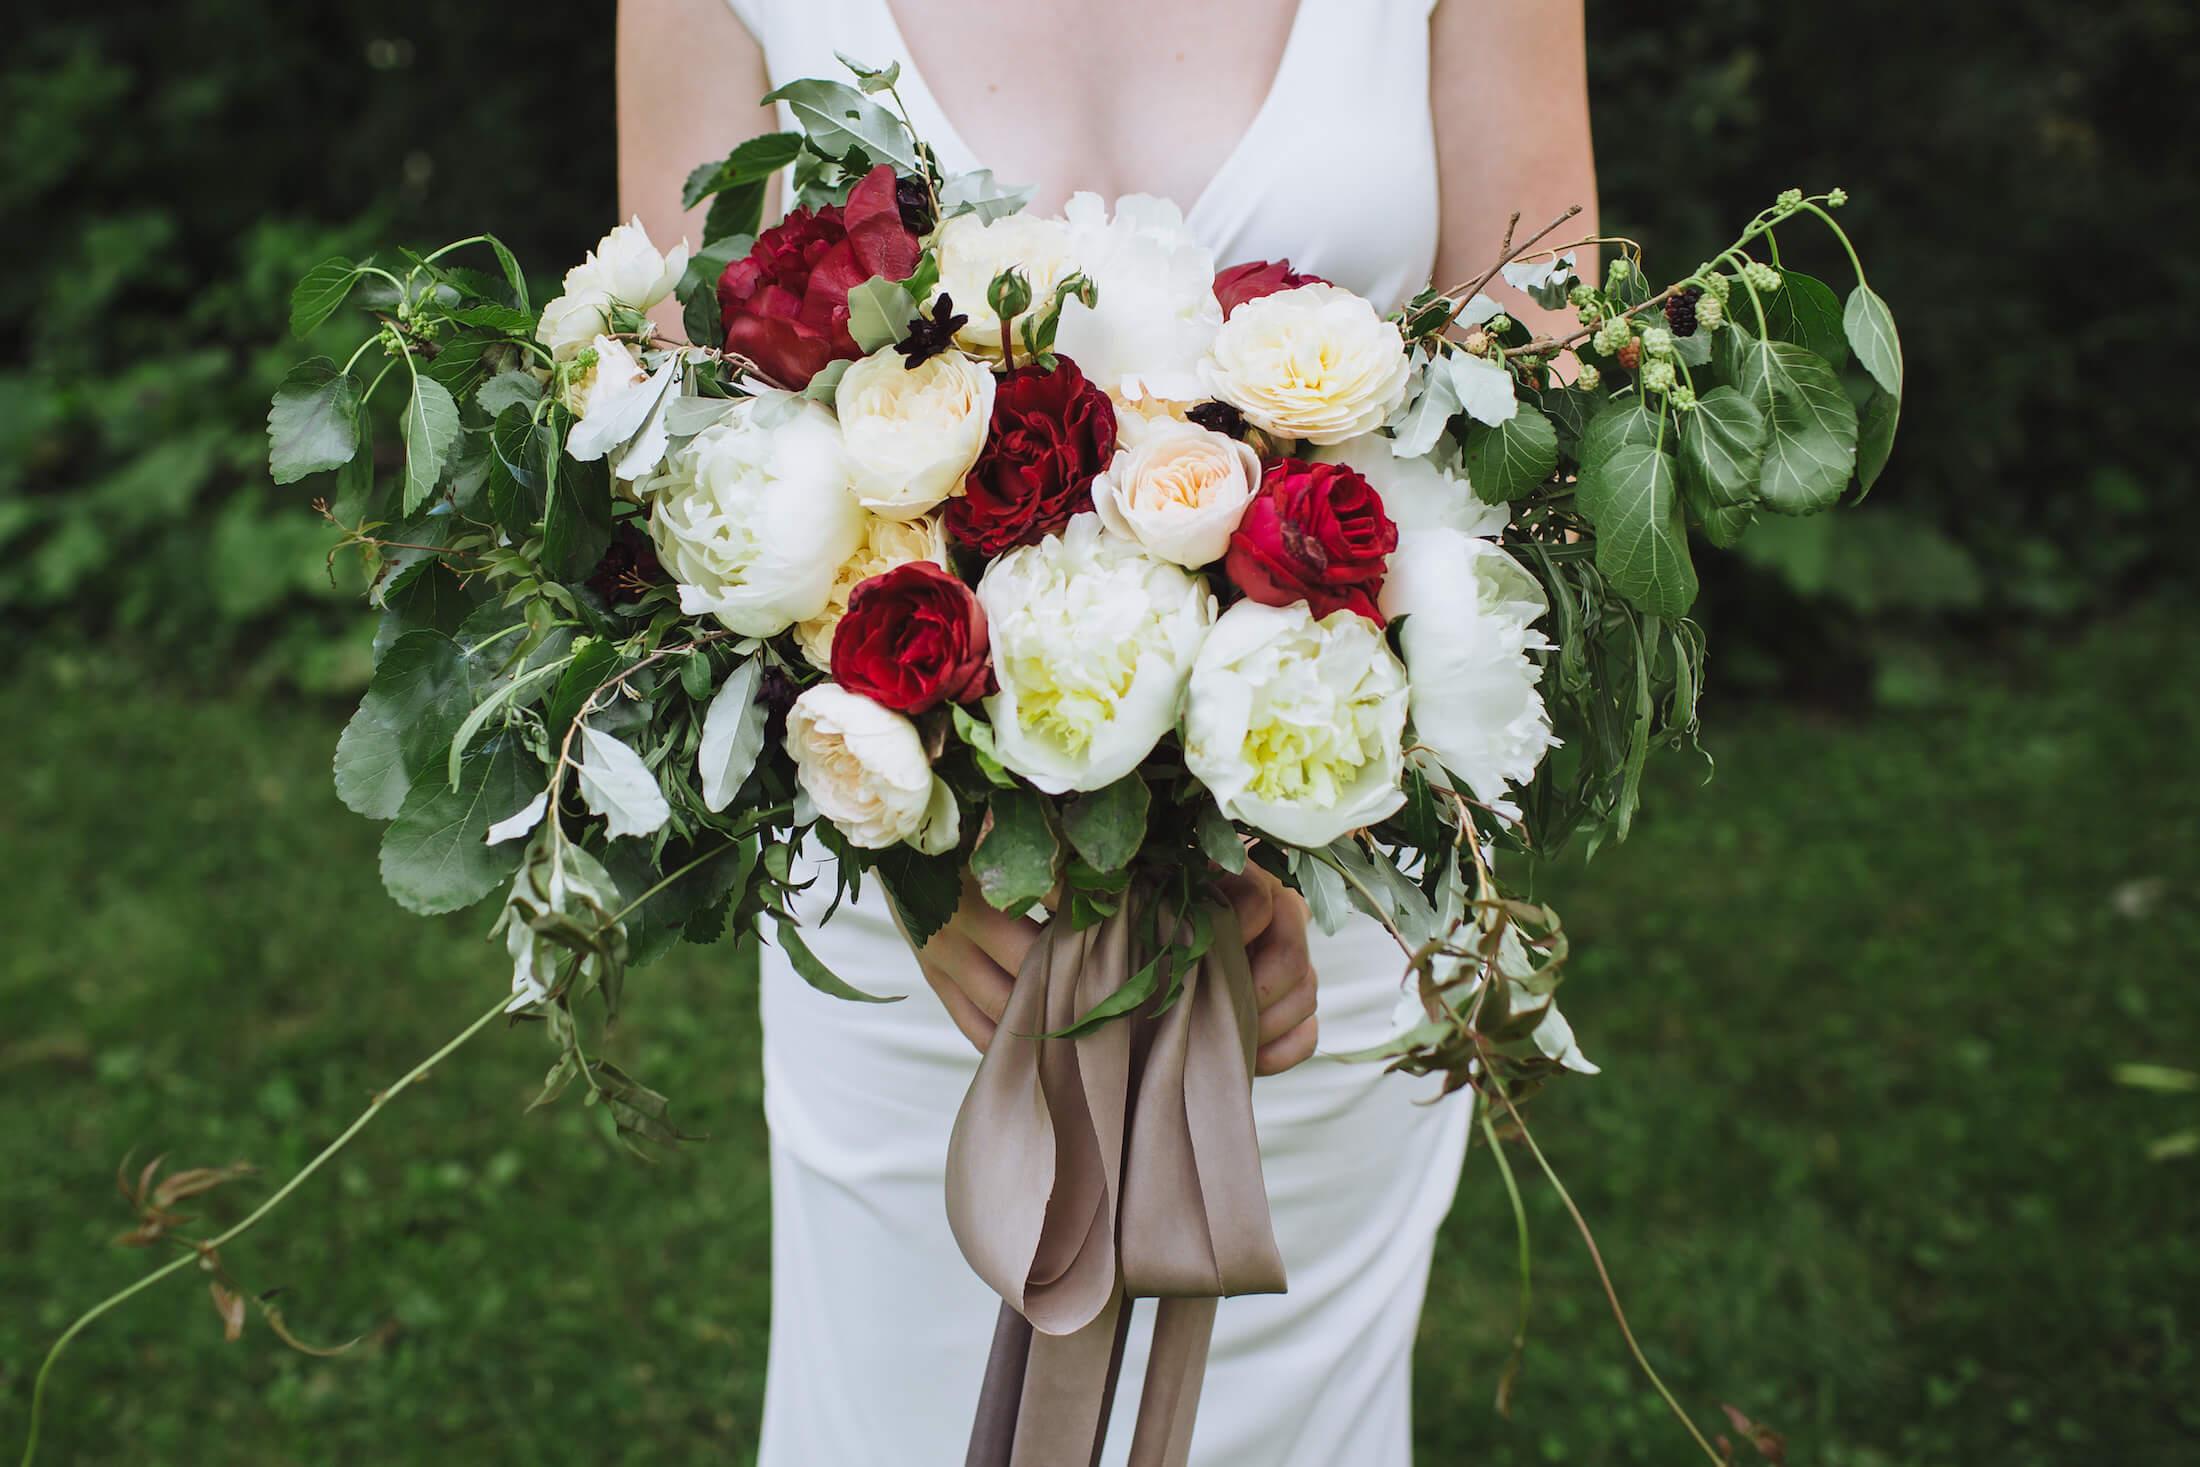 engle-olson-ray-kelly-photography-wisconsin-wedding-46.jpg